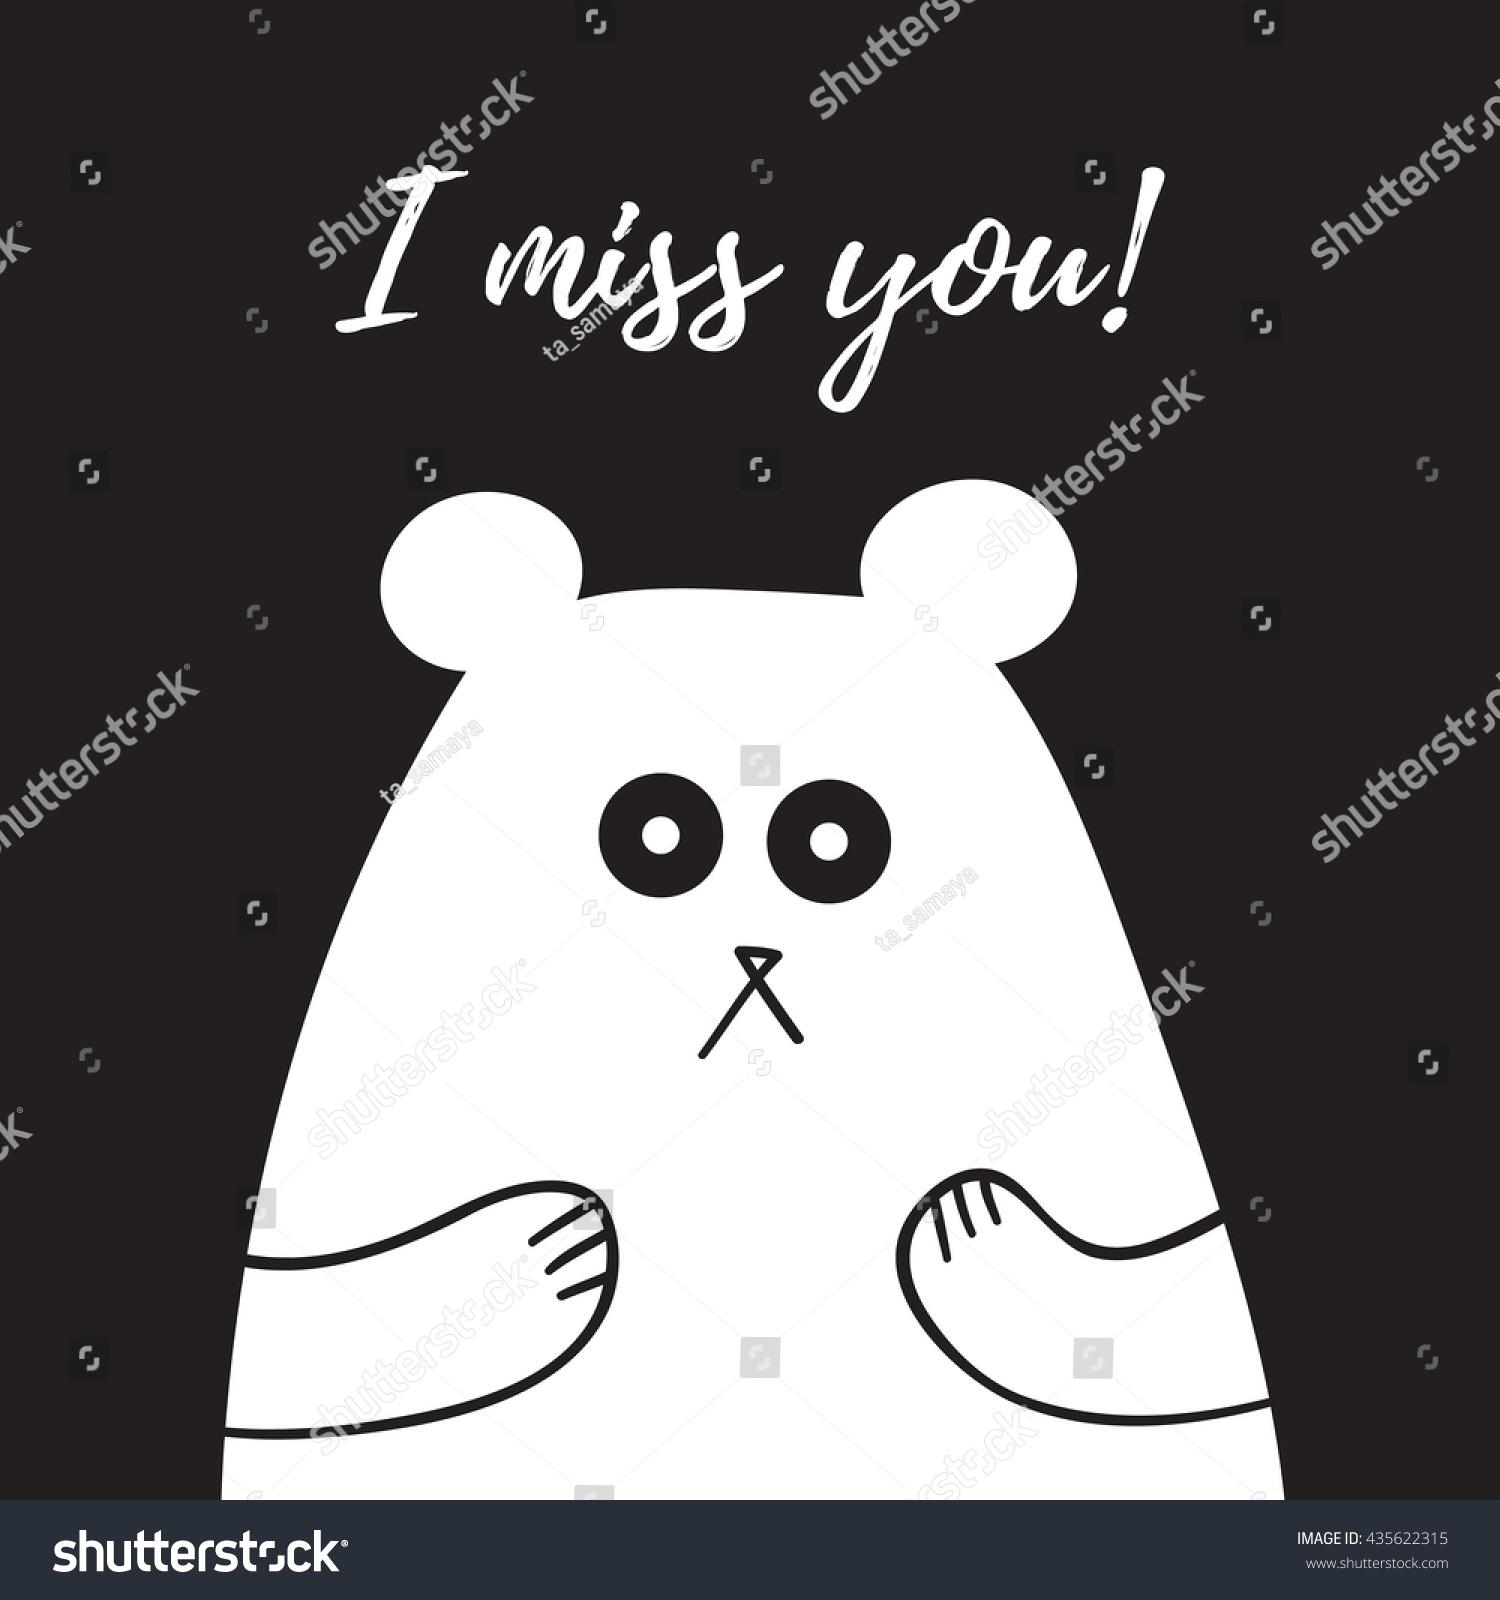 I Miss You Phring Karte Mit Stock Vektorgrafik Lizenzfrei 435622315